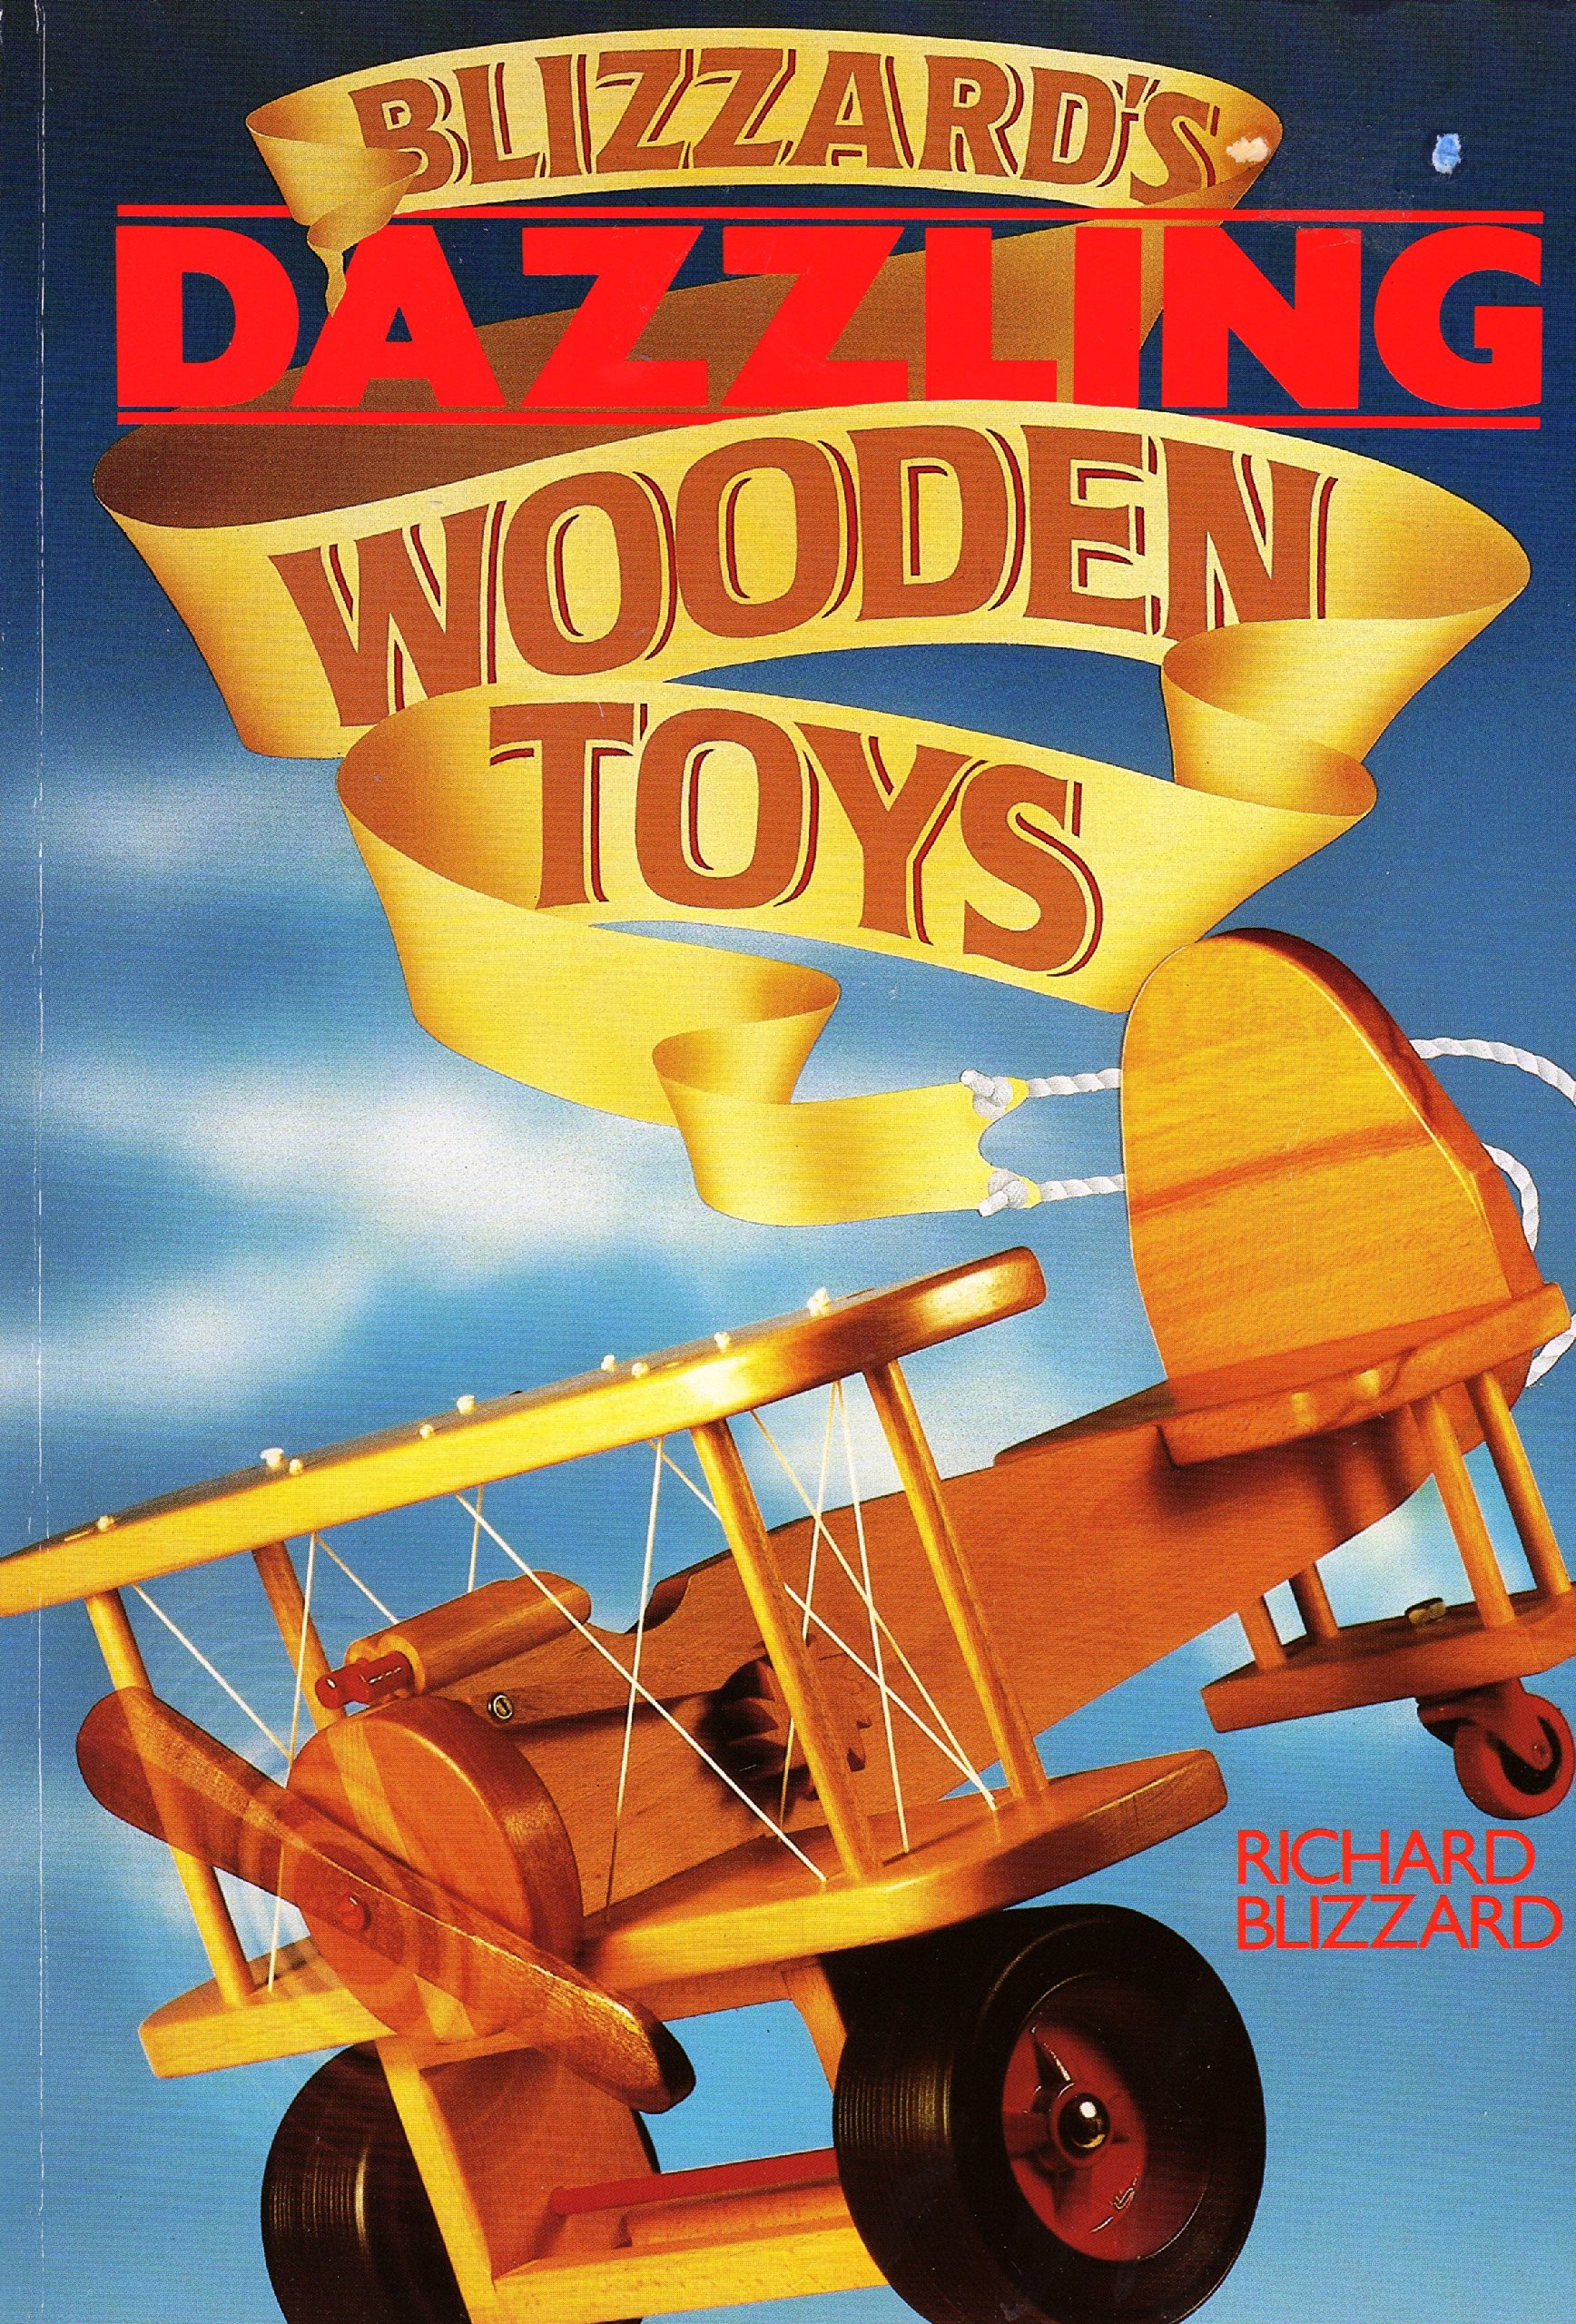 Blizzards Dazzling Wooden Toys Amazoncouk Richard Blizzard